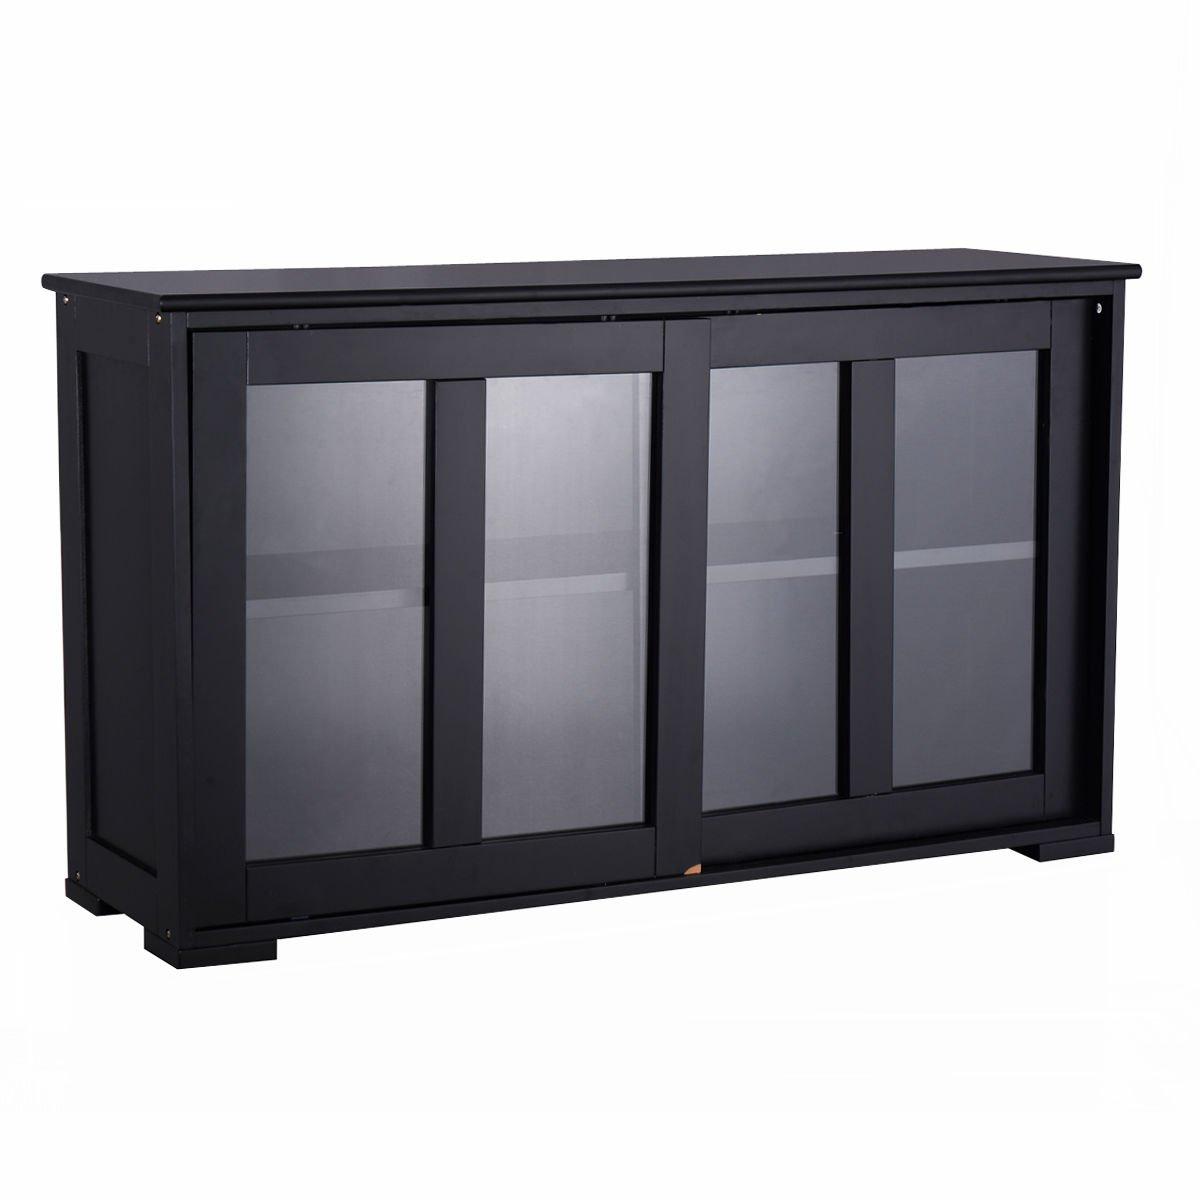 Heaven Tvcz Storage Cabinet Sideboard Buffet Server Wine Cupboard Glass Sliding Door Pantry Kitchen Pantry Display Hutch Furniture